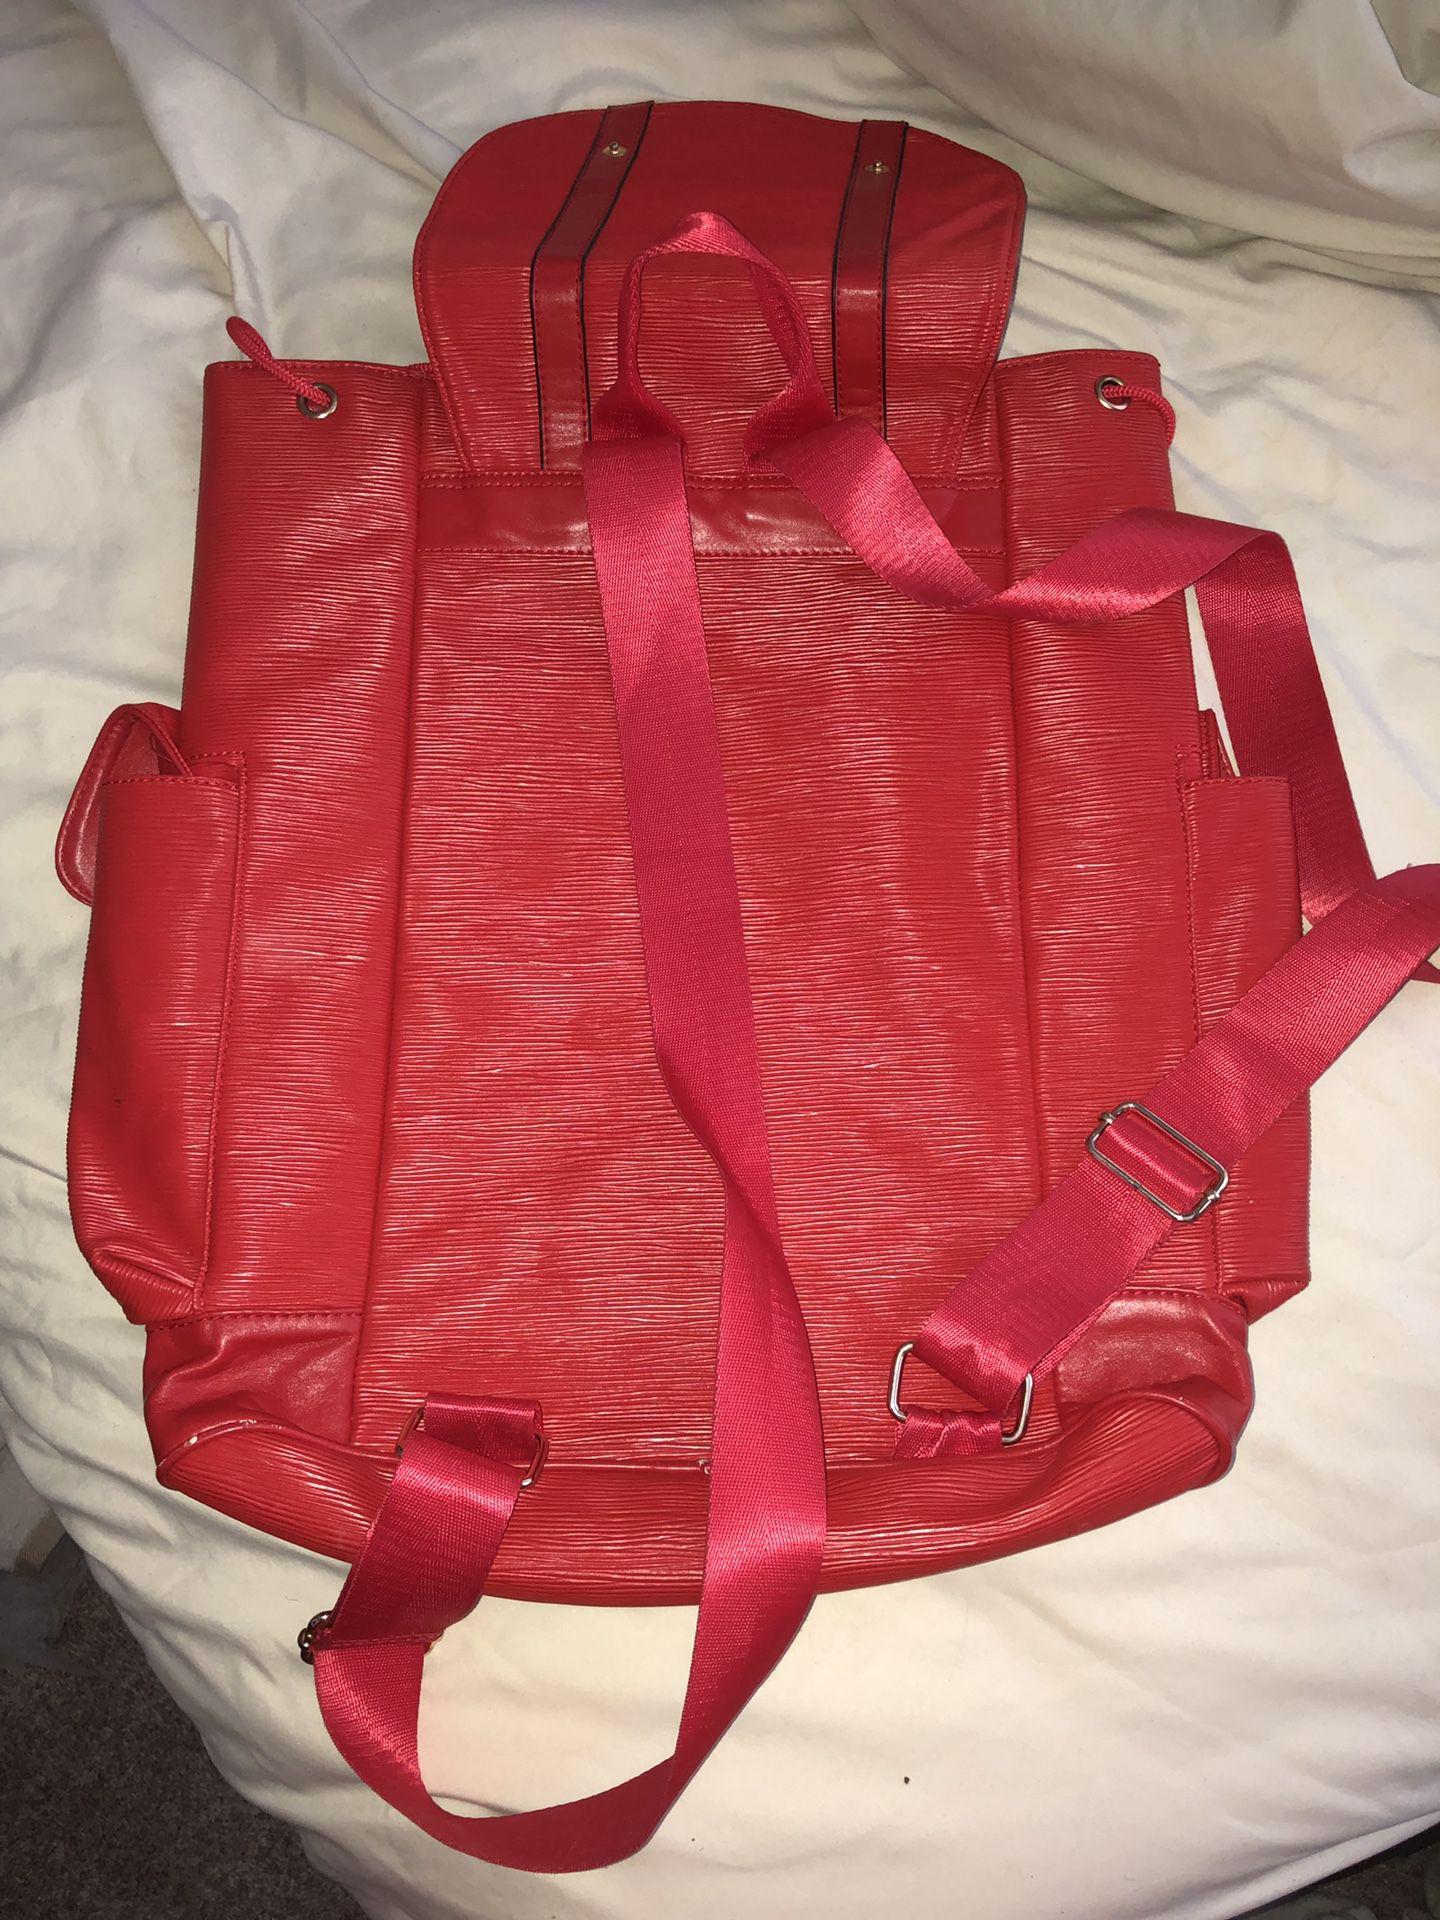 Supreme X Louis Vuitton Collin Bag